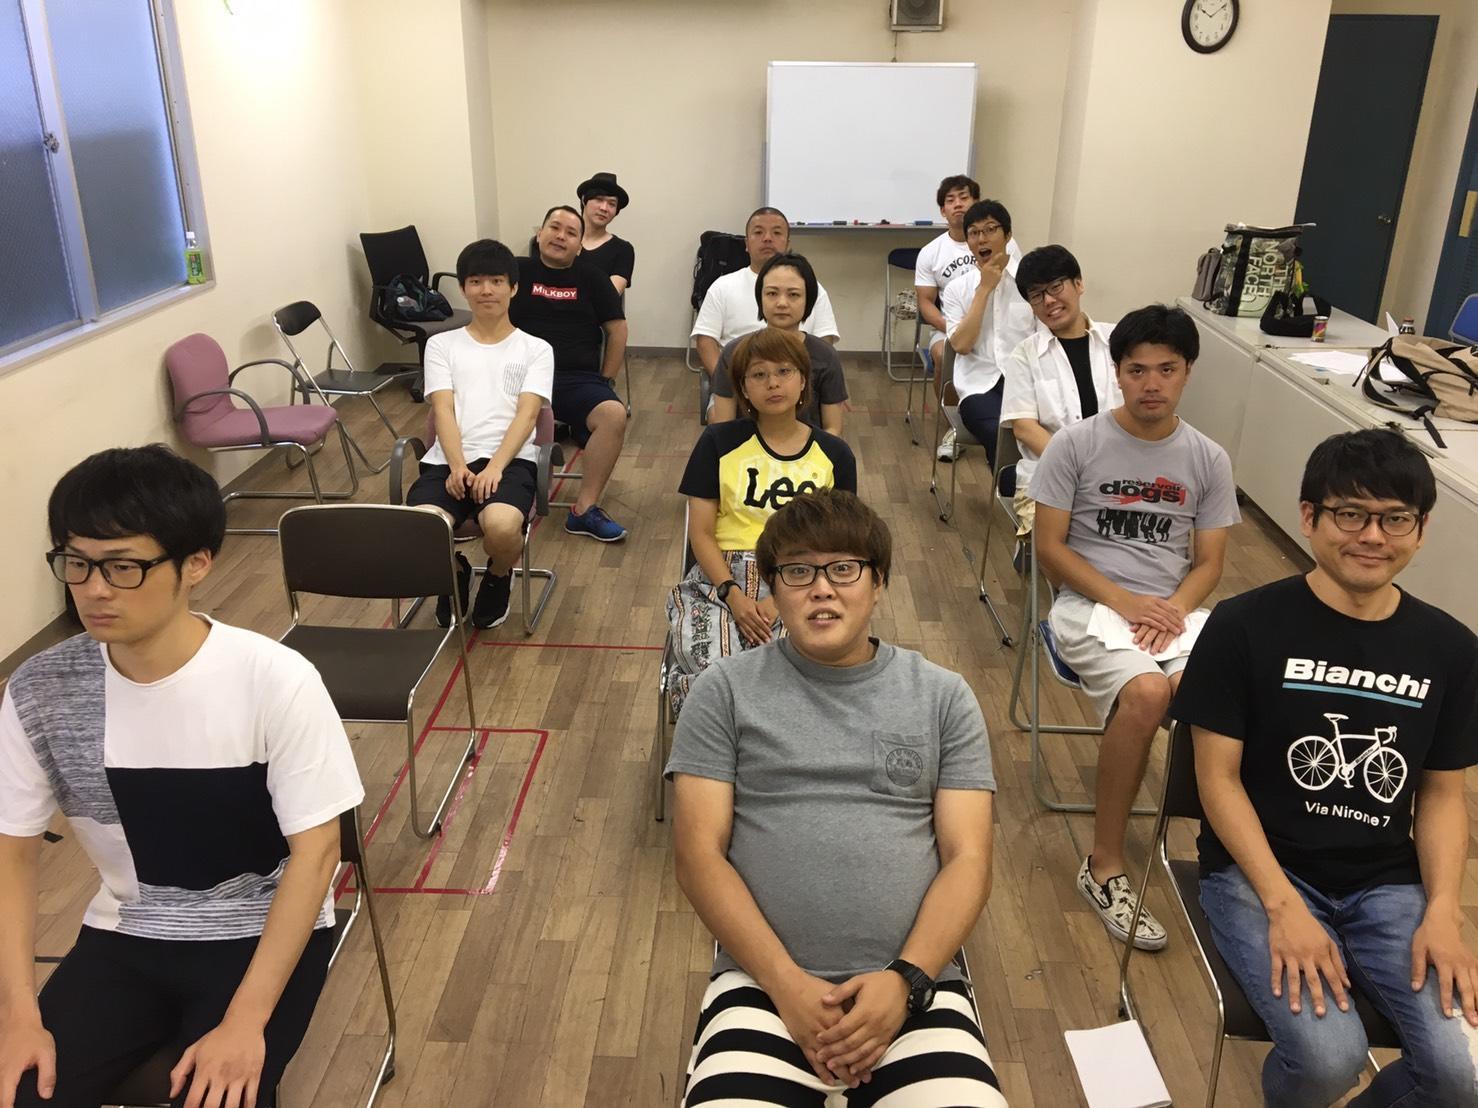 http://news.yoshimoto.co.jp/20170812183612-449dbceab02ae67534999ea1d75923fd32c7973a.jpeg